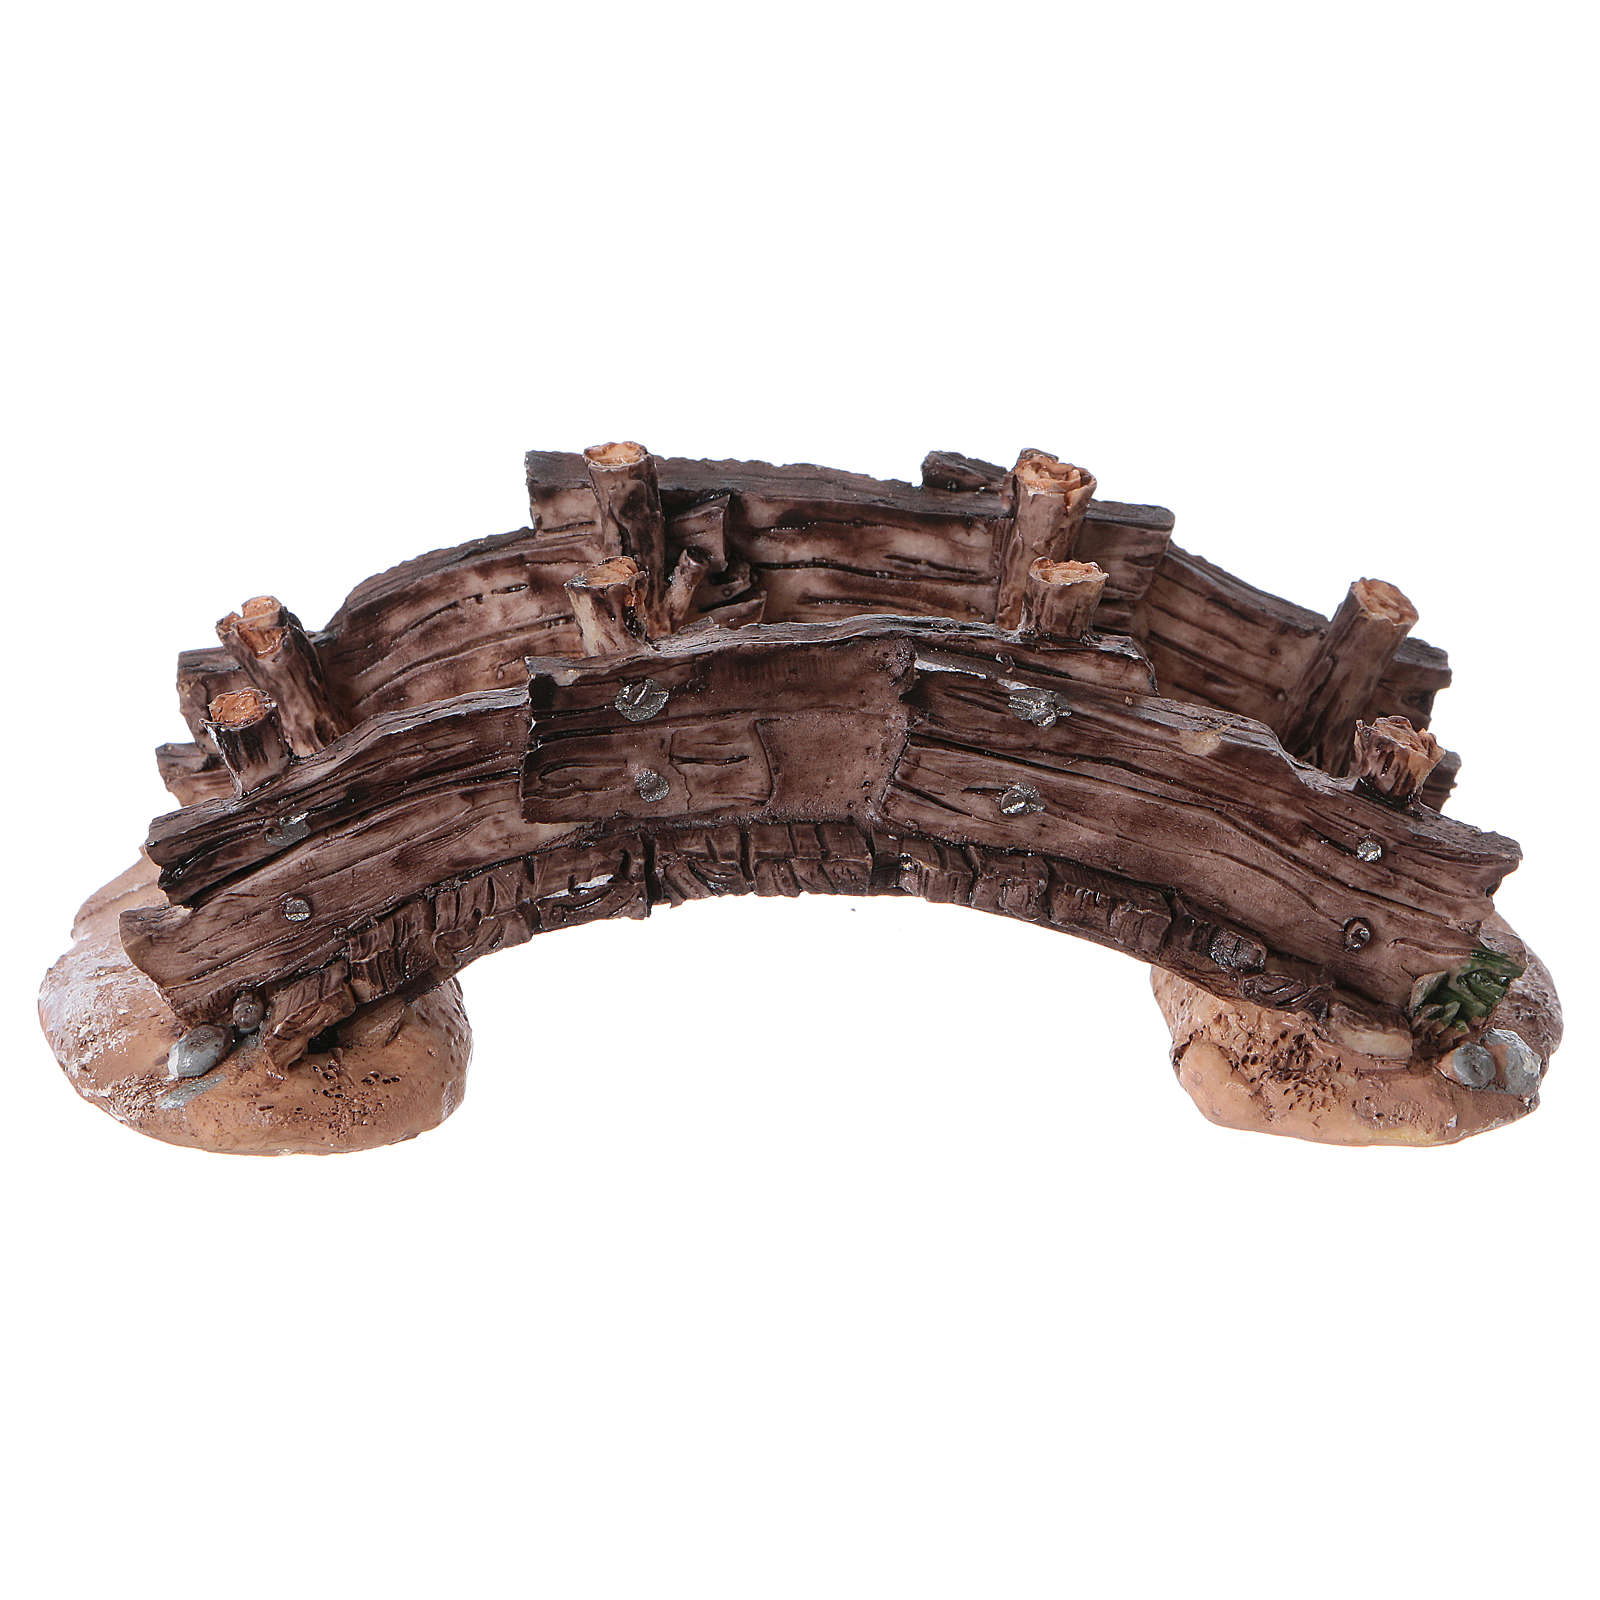 Pont miniature crèche noël 14.5x7x5 4